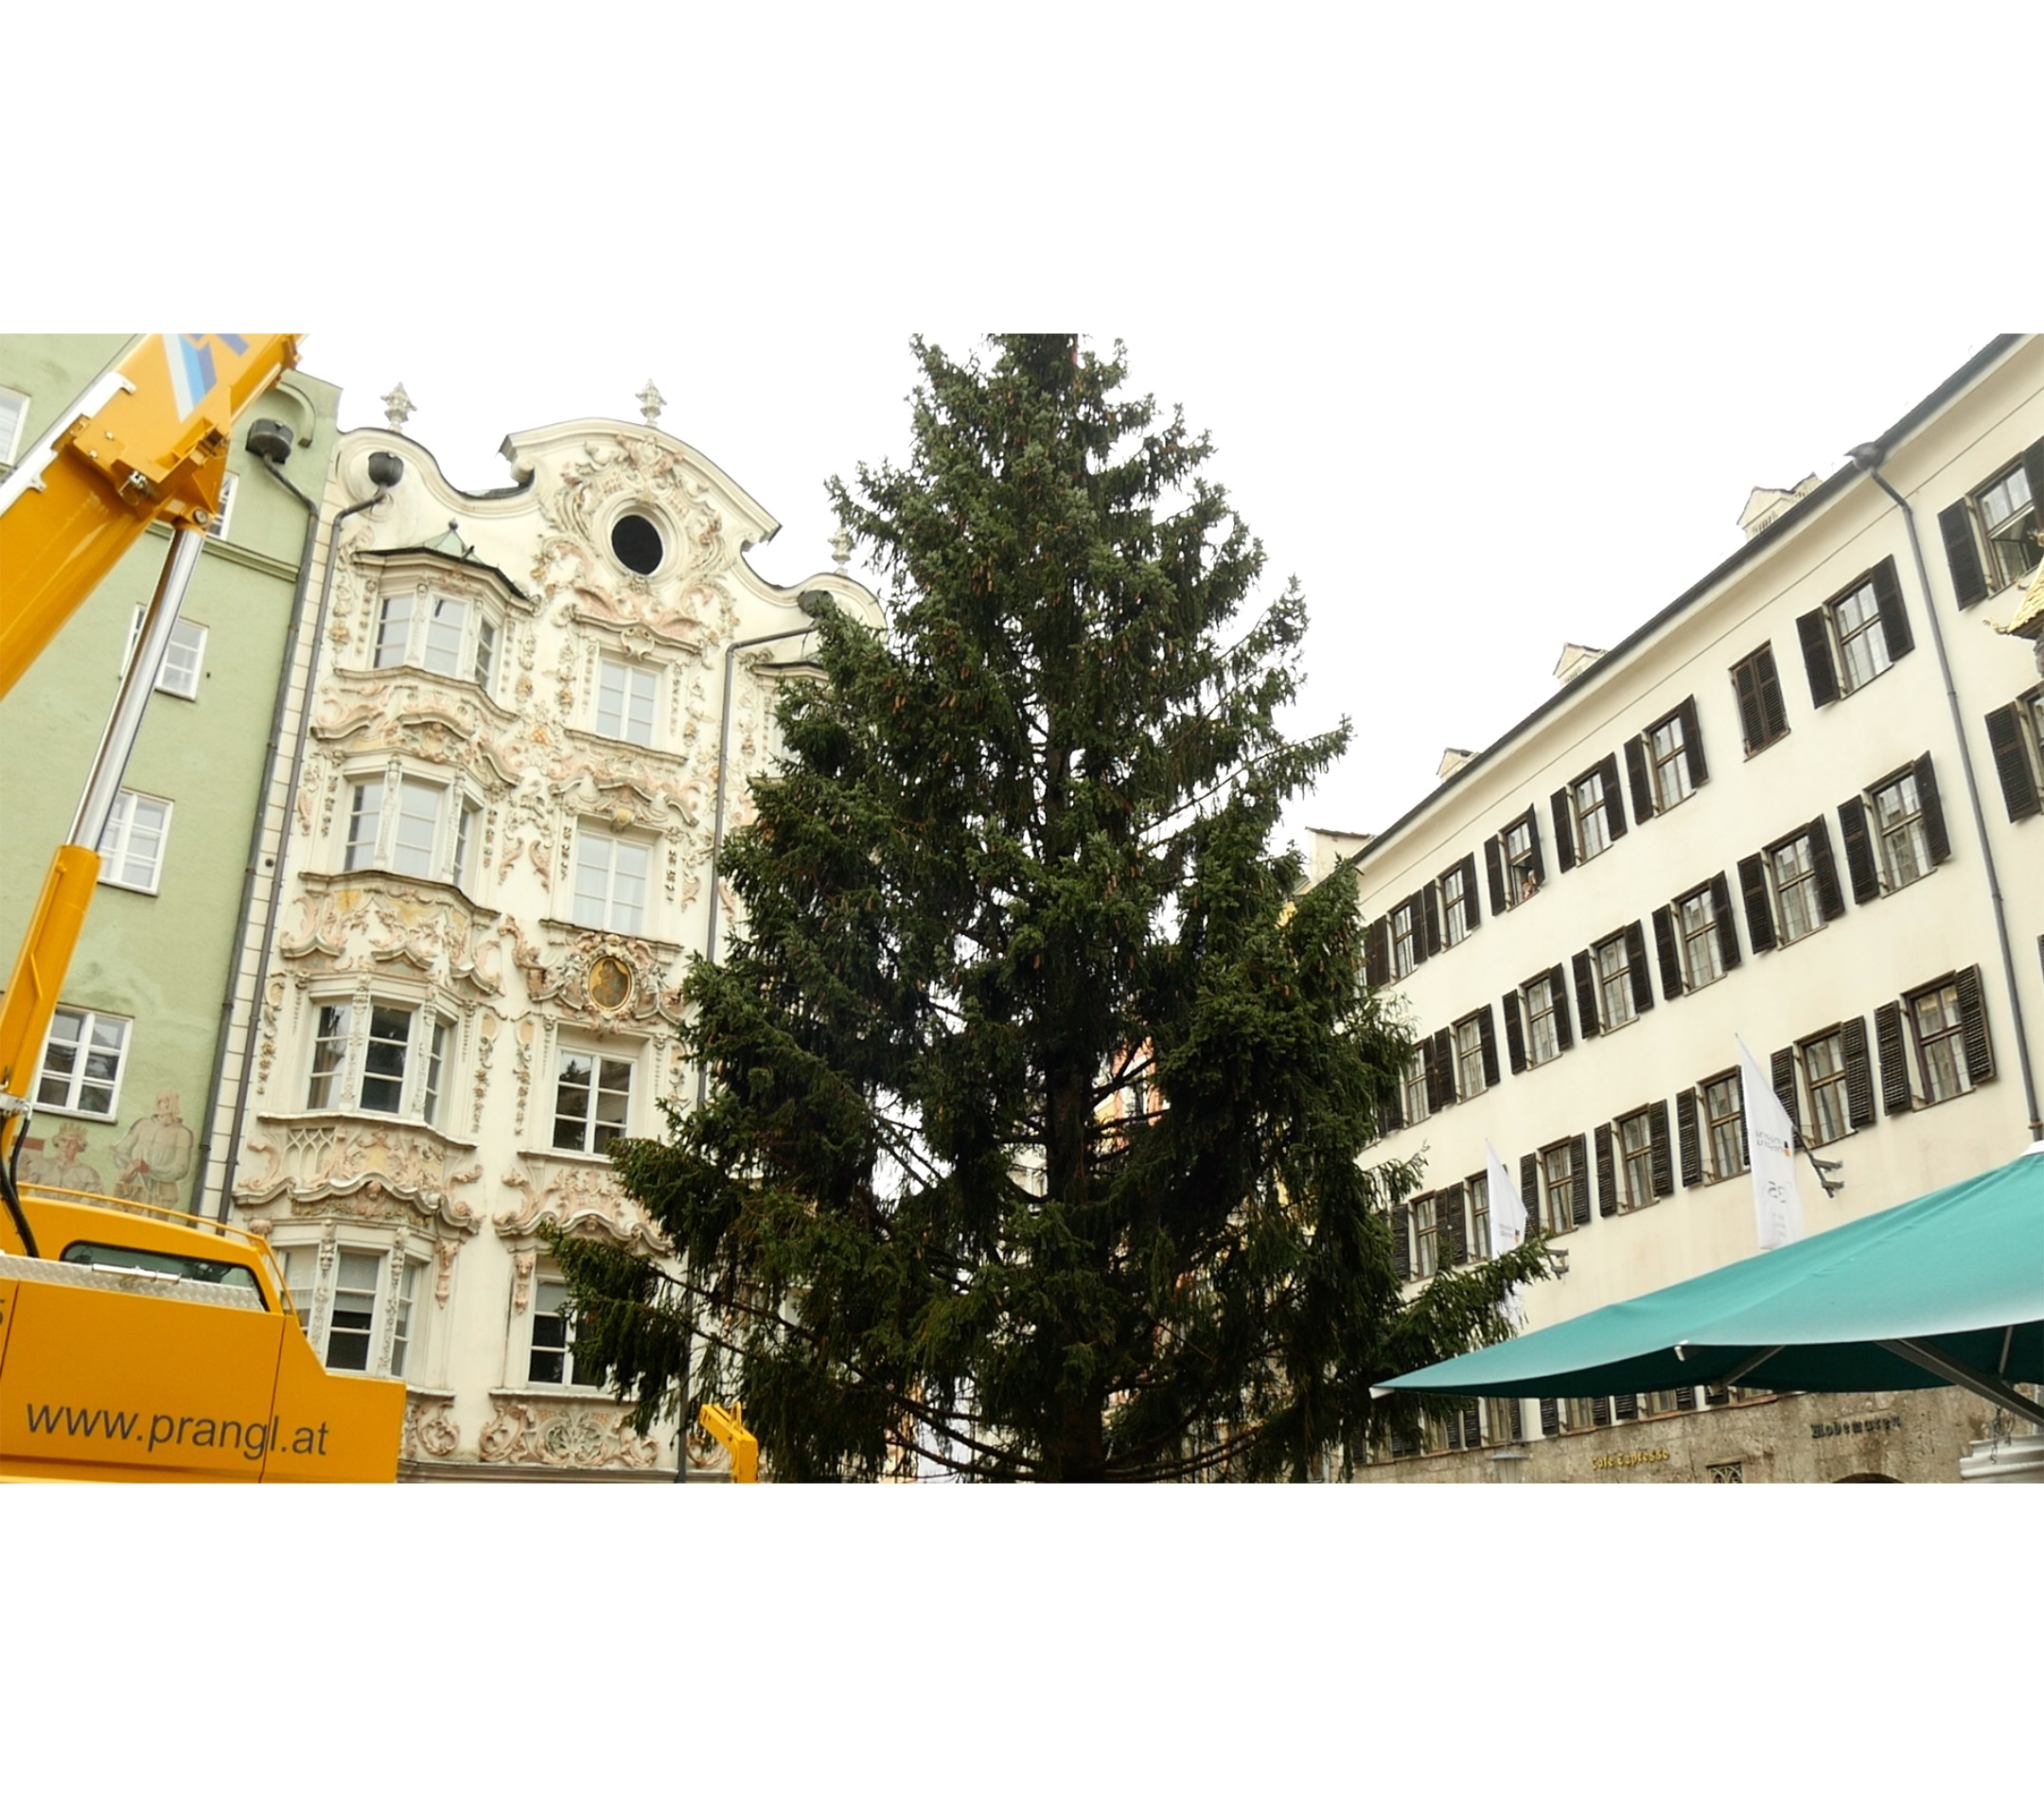 Der Innsbrucker Christbaum steht bereits